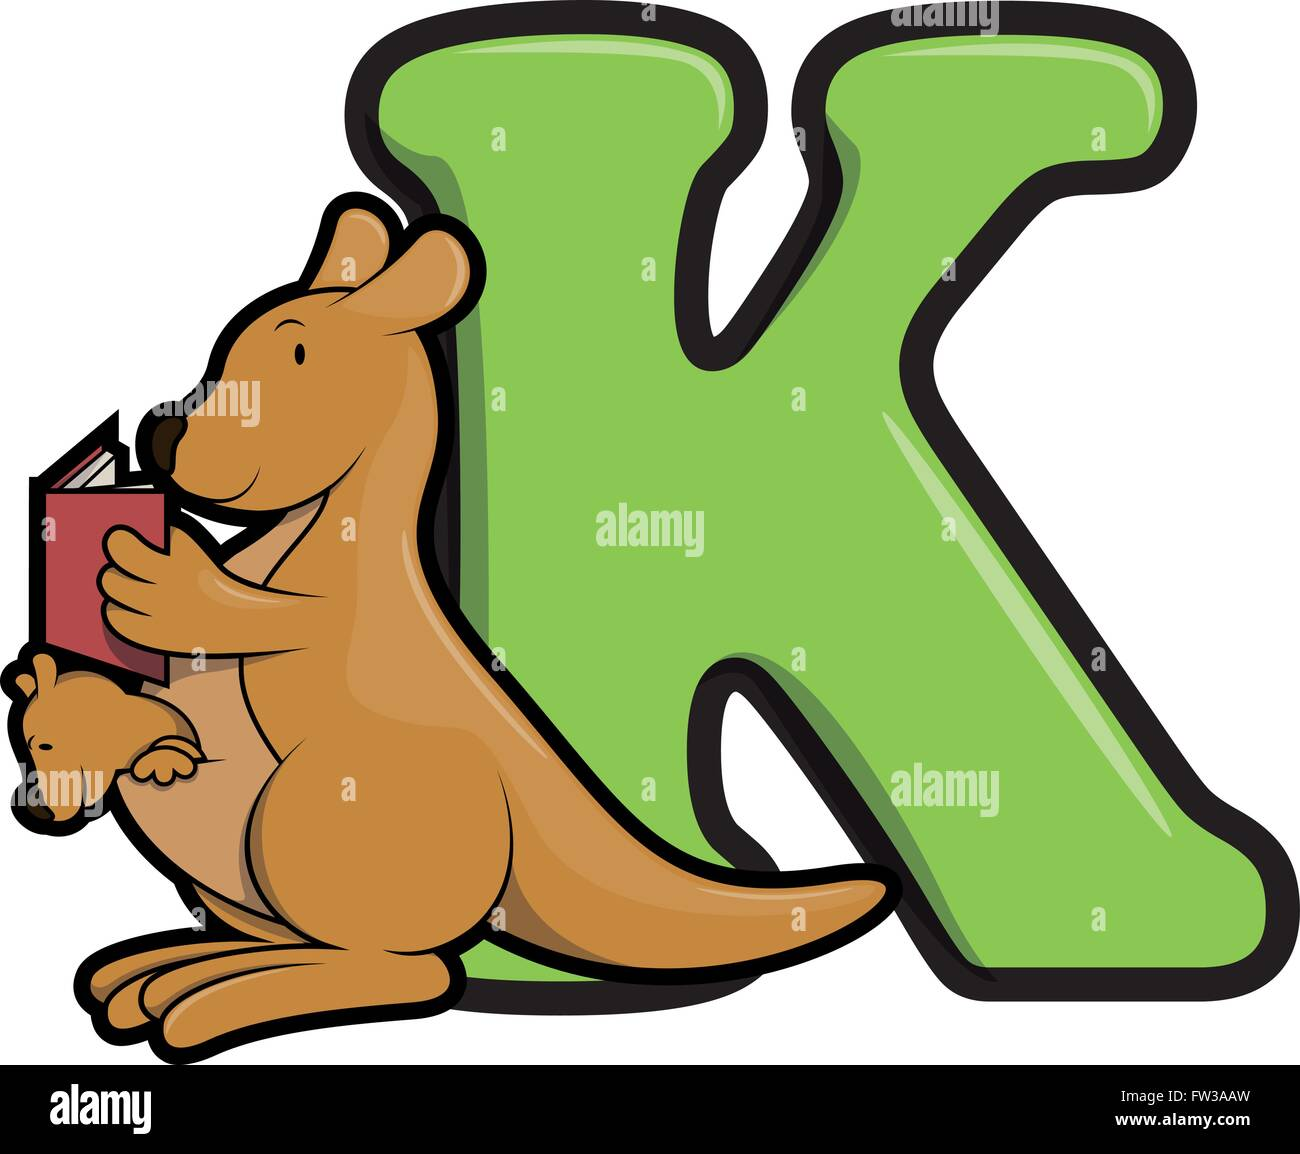 K Is For Kangaroo Stock Photos Amp K Is For Kangaroo Stock